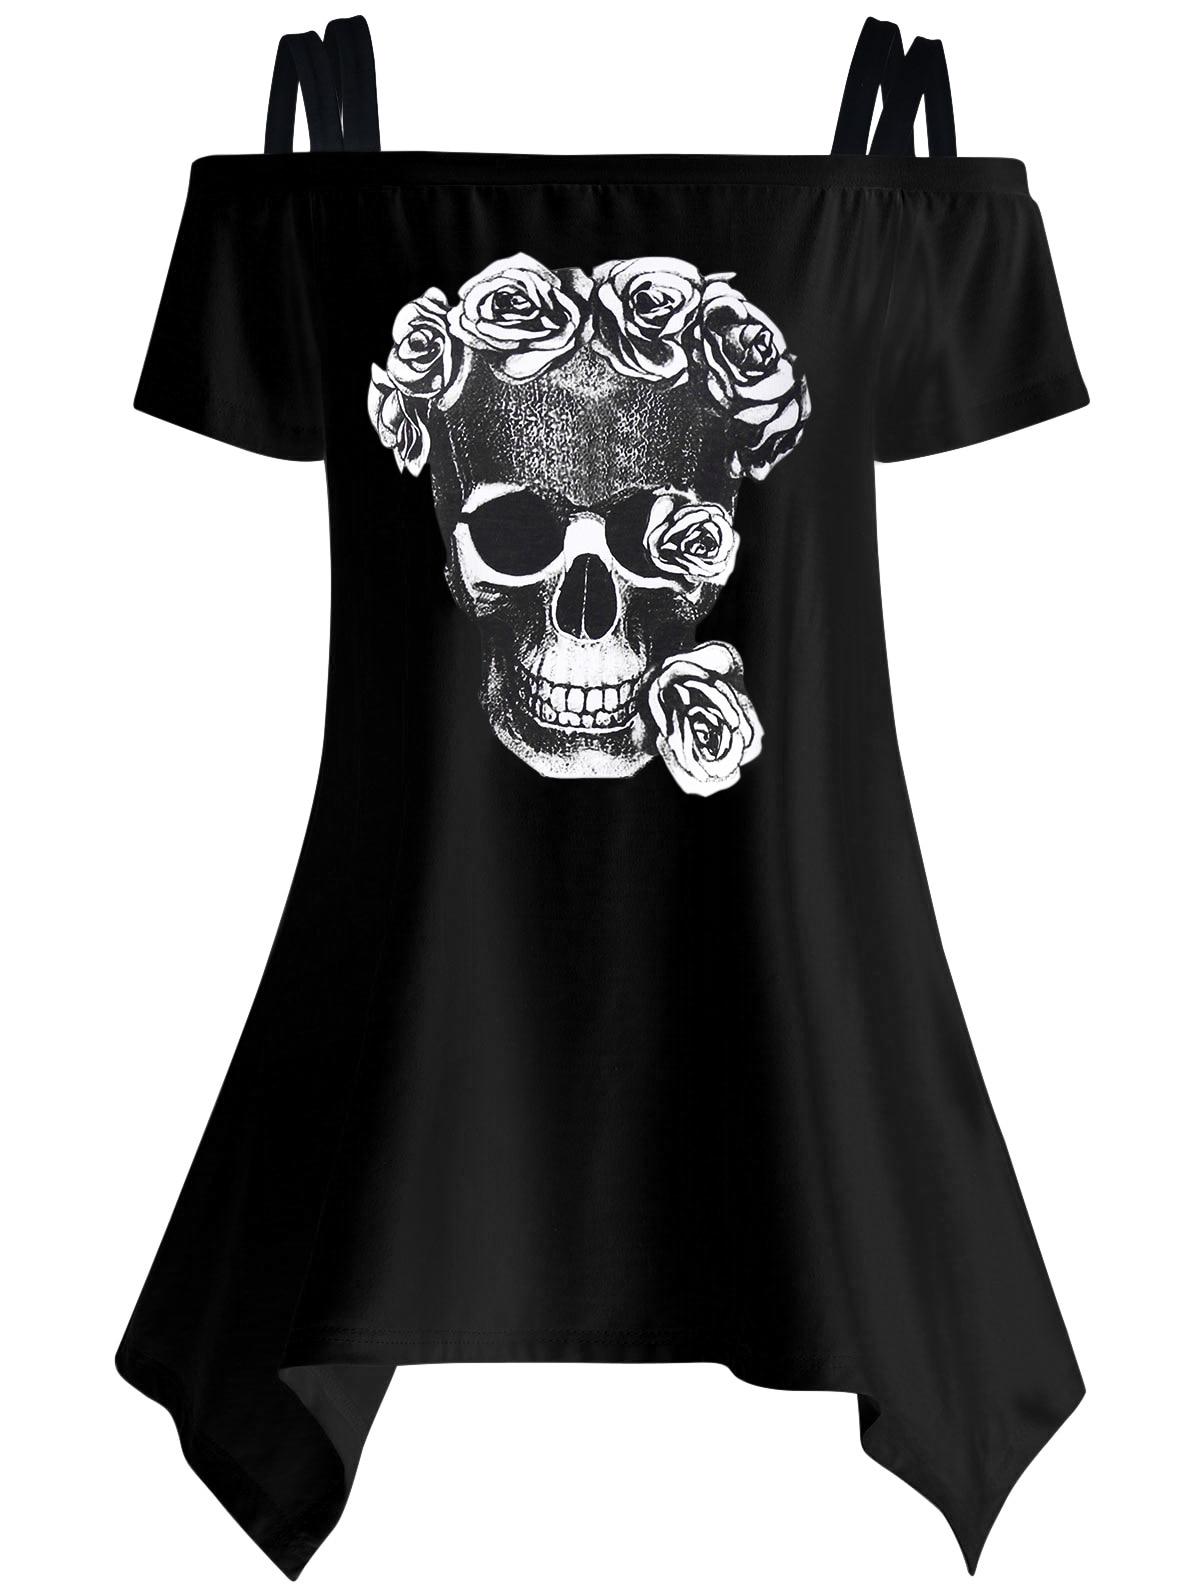 Women Casual Short Sleeeve T-shirts Skull Print T-shirts Off Shoulder Female 2017 Summer Tunic Mujer Women Tops LJ9615E